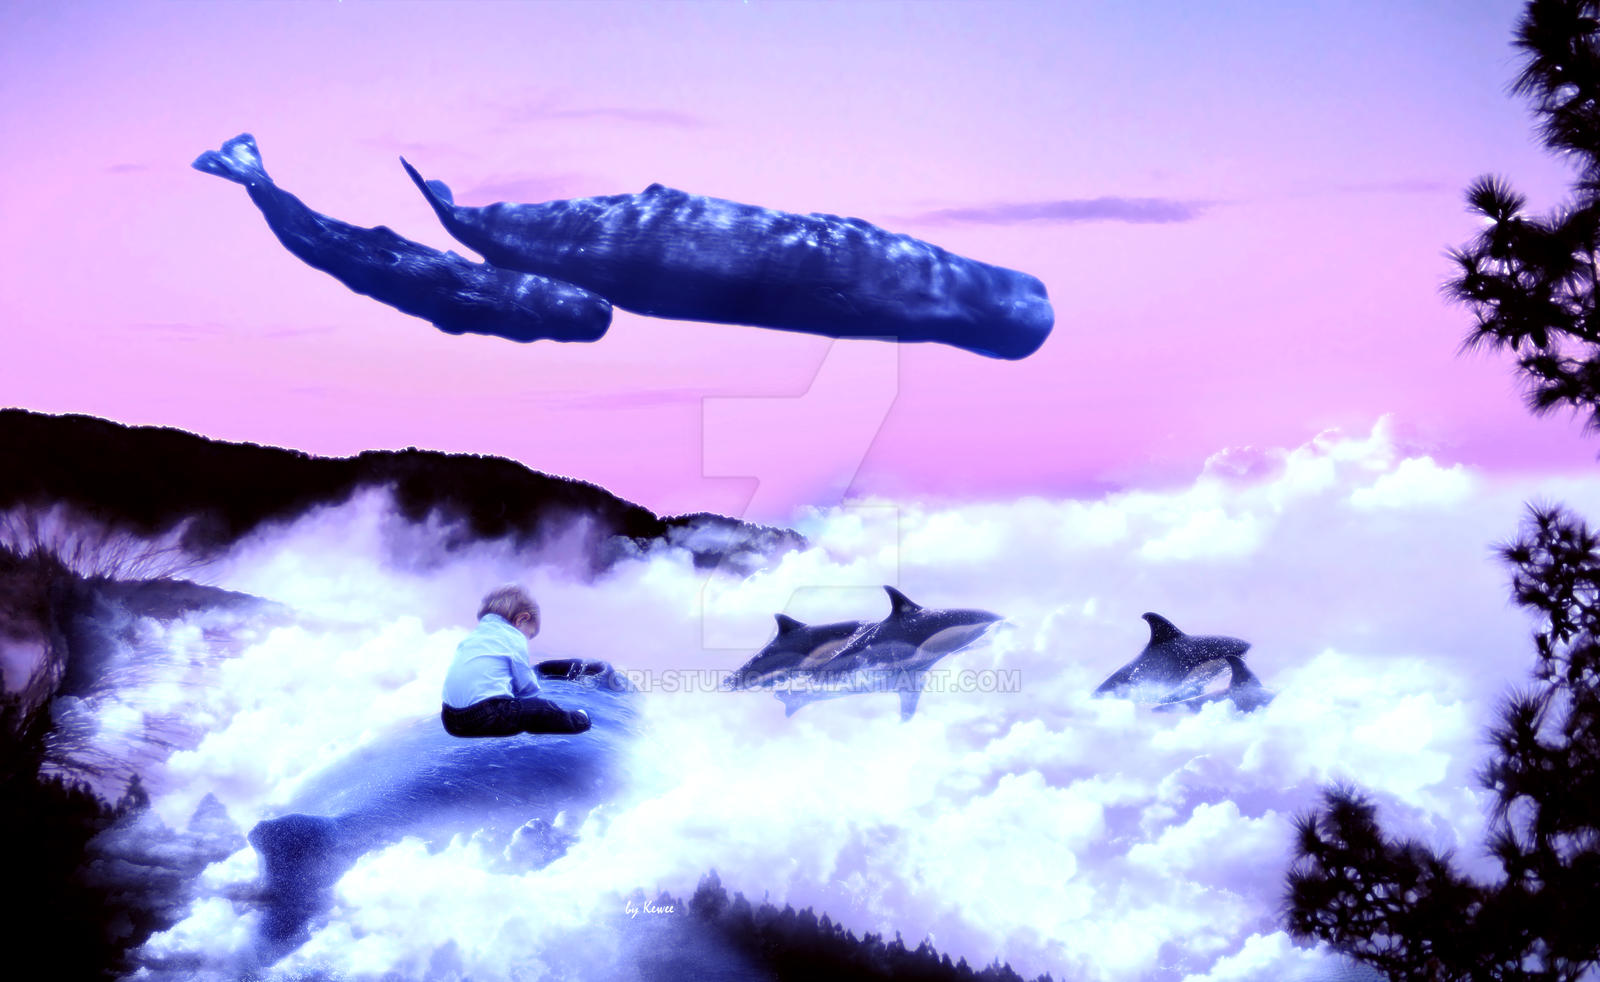 Whale migration by Cri-Studio